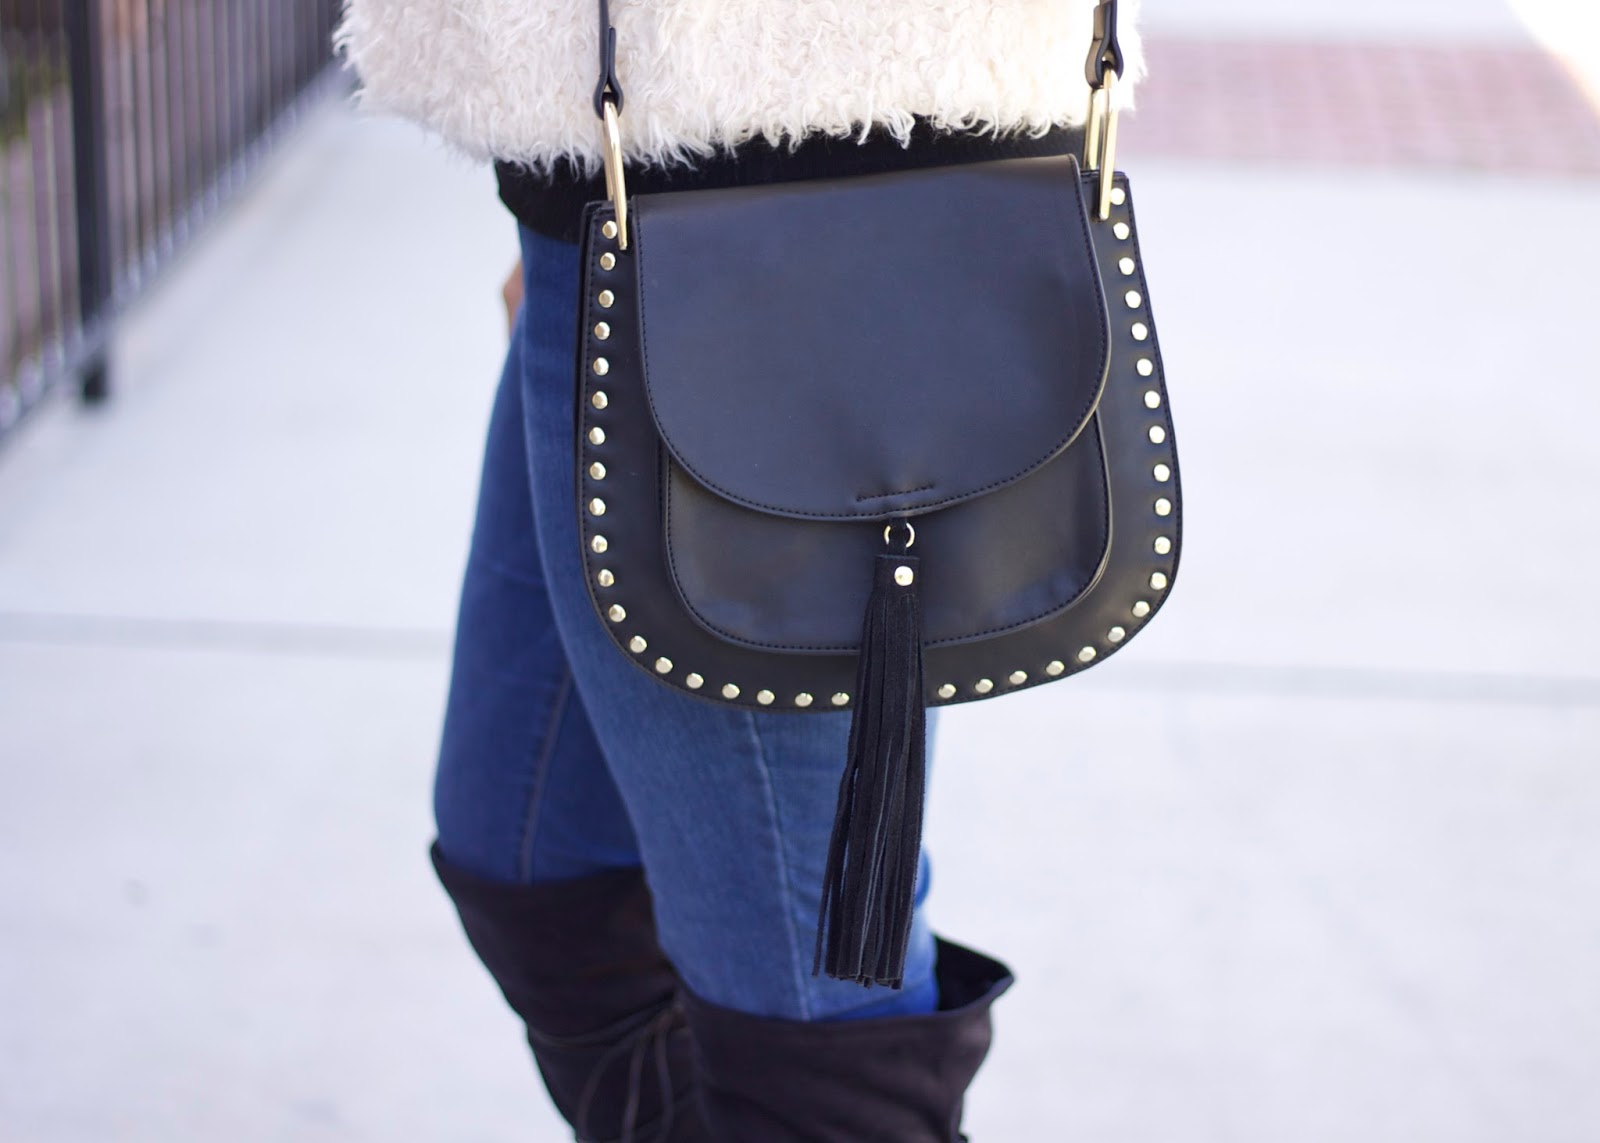 Galian Adabelle Handbag, Galian blogger, affordable handbags, high quality purses under $100